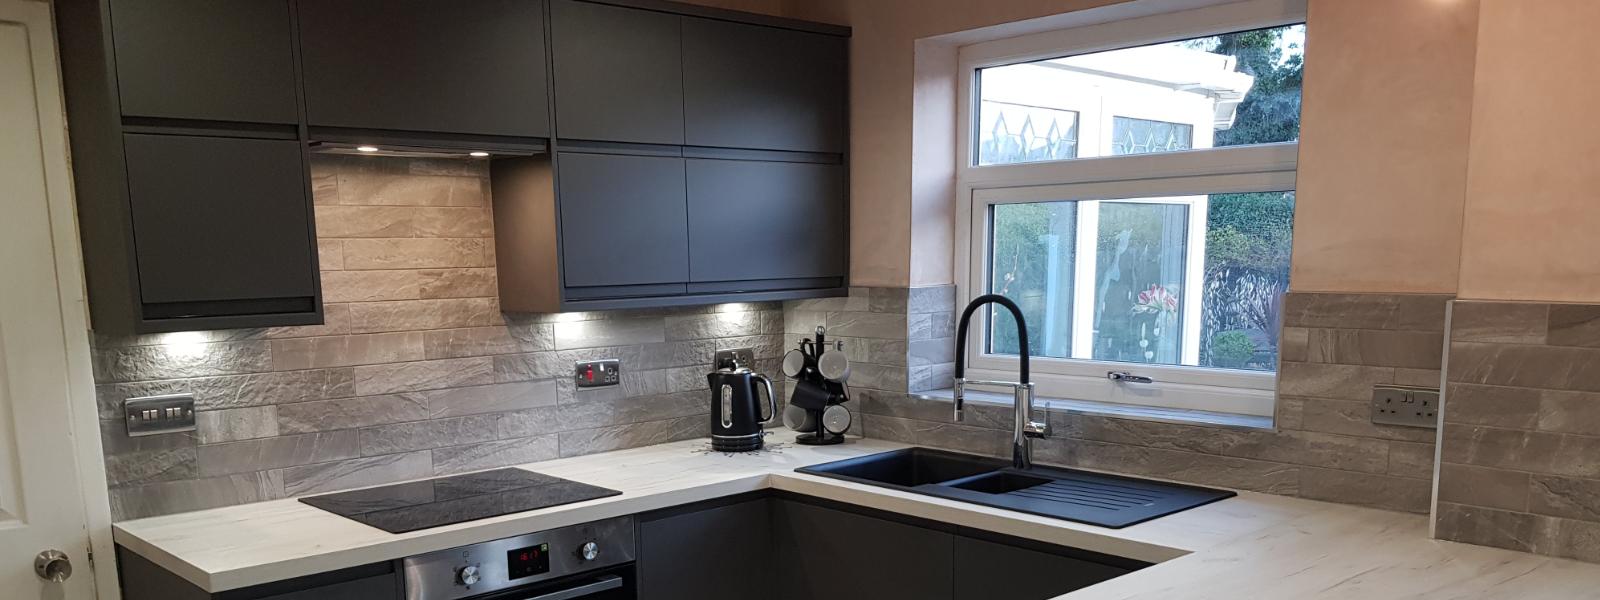 Bathroom and Kitchen Installation In Crewe